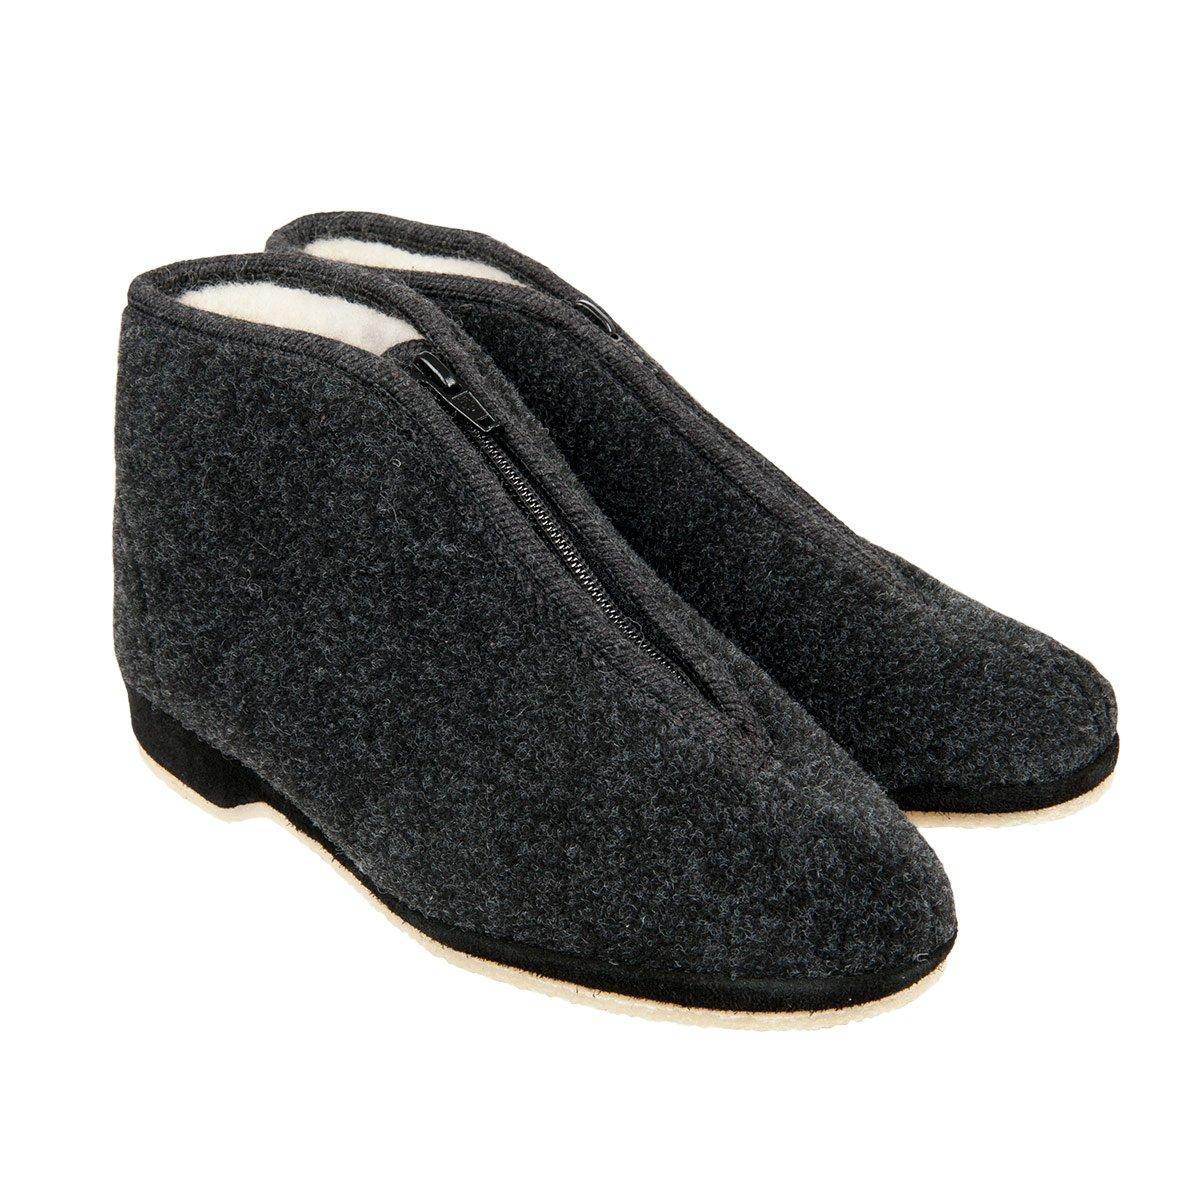 timeless design 23522 40d78 Pantofole alte in pura lana con cerniera